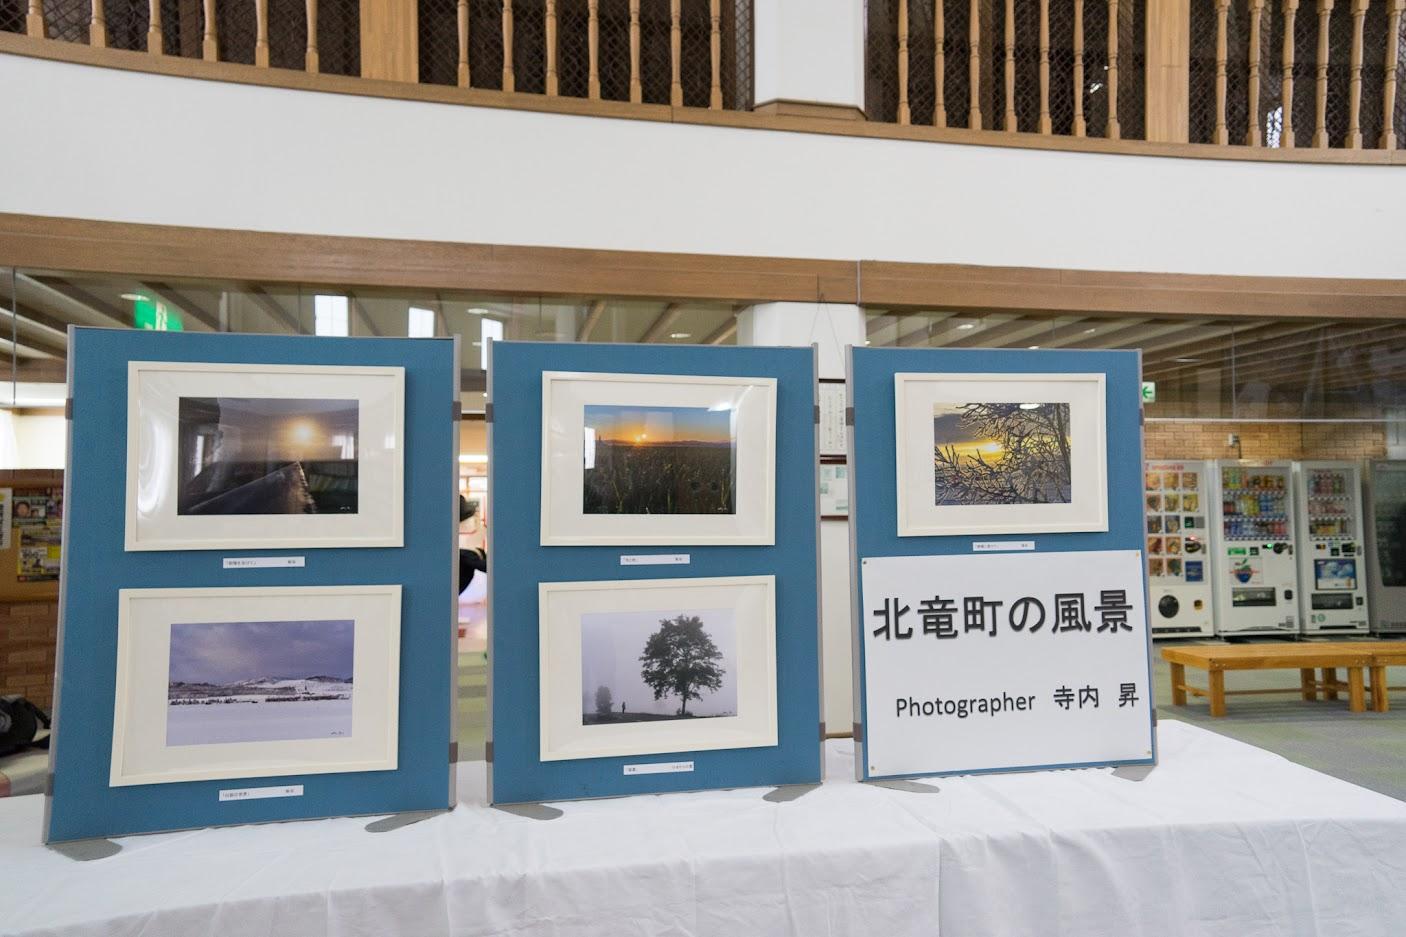 「北竜町の風景」写真展